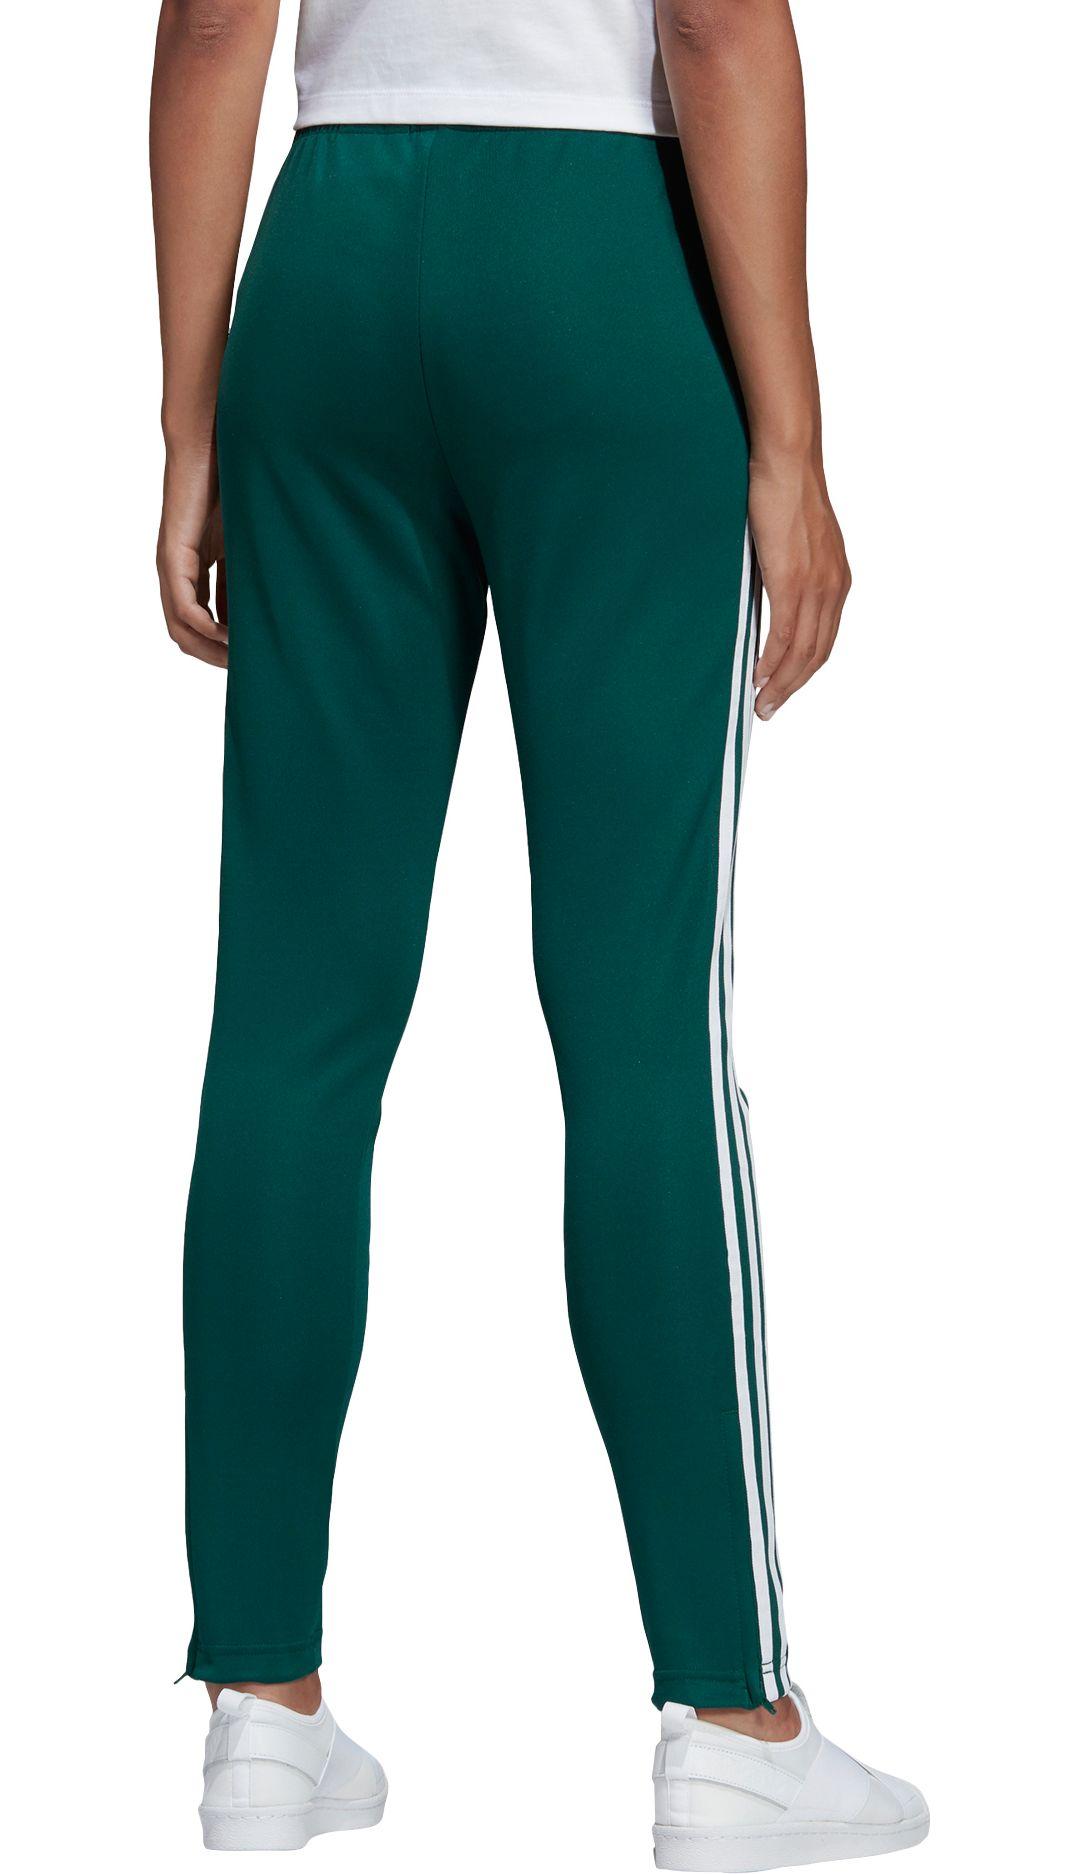 fc44d781a71c adidas Originals Women's Track Pants | DICK'S Sporting Goods